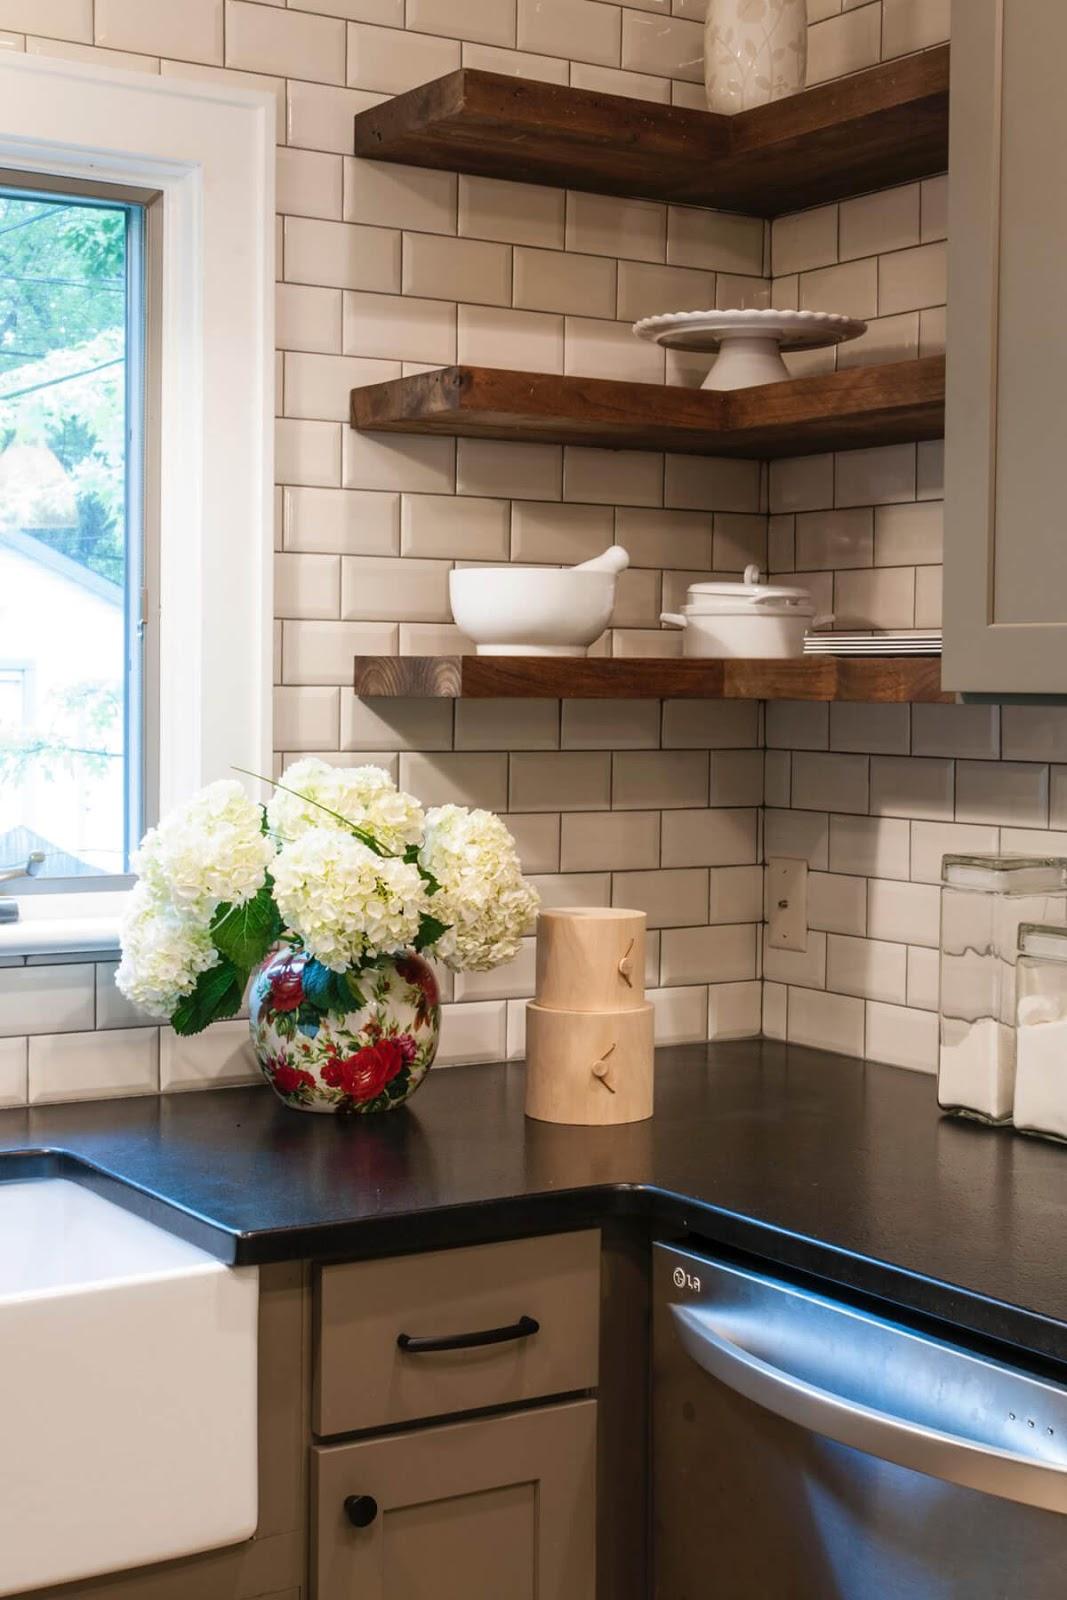 68 Cottage Kitchen Decorating Ideas – Luvne.com